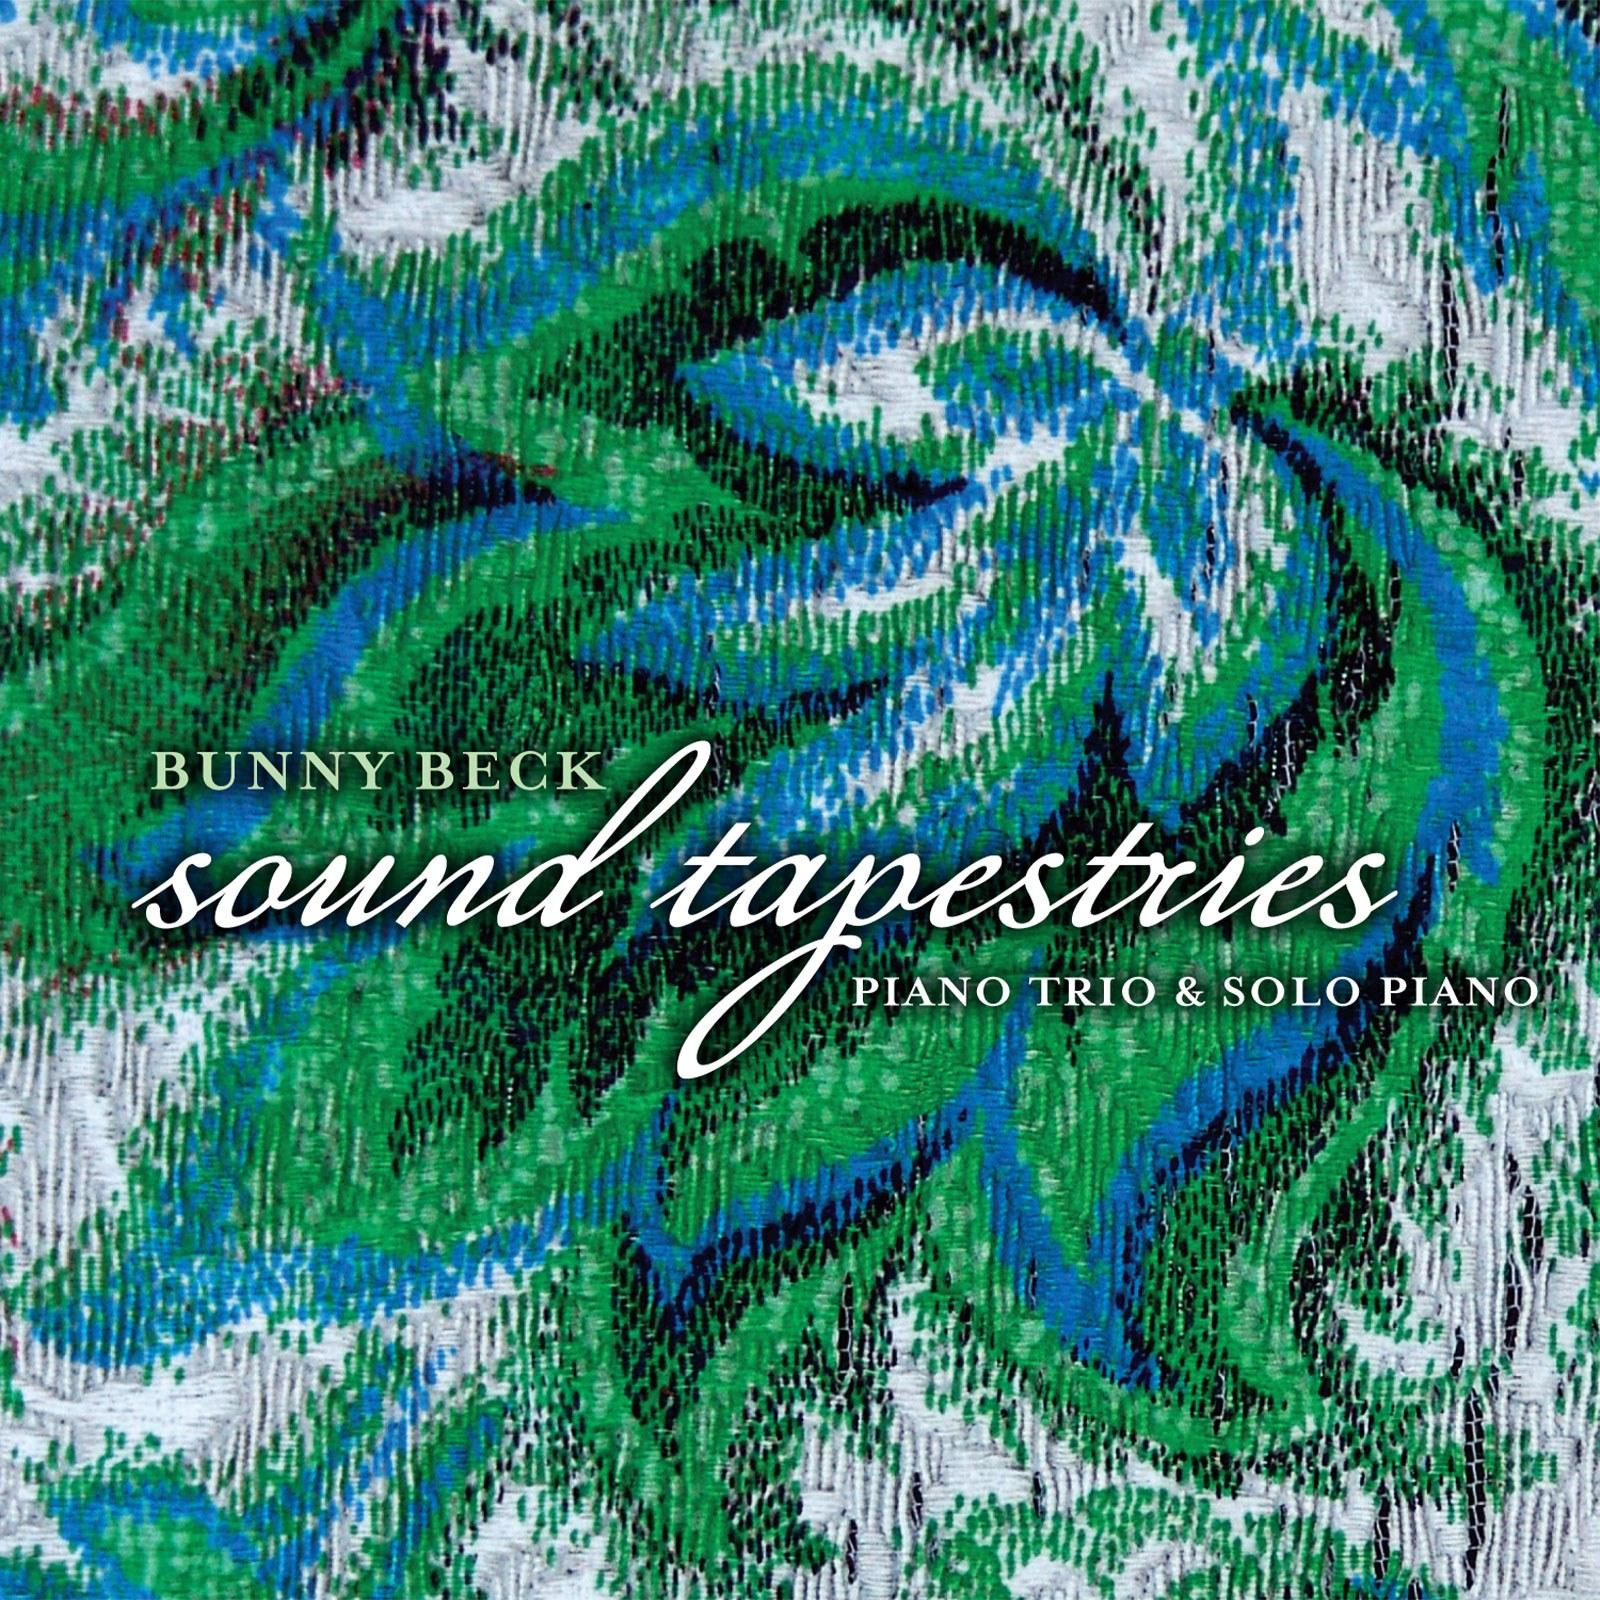 SOUND TAPESTRIES - album cover